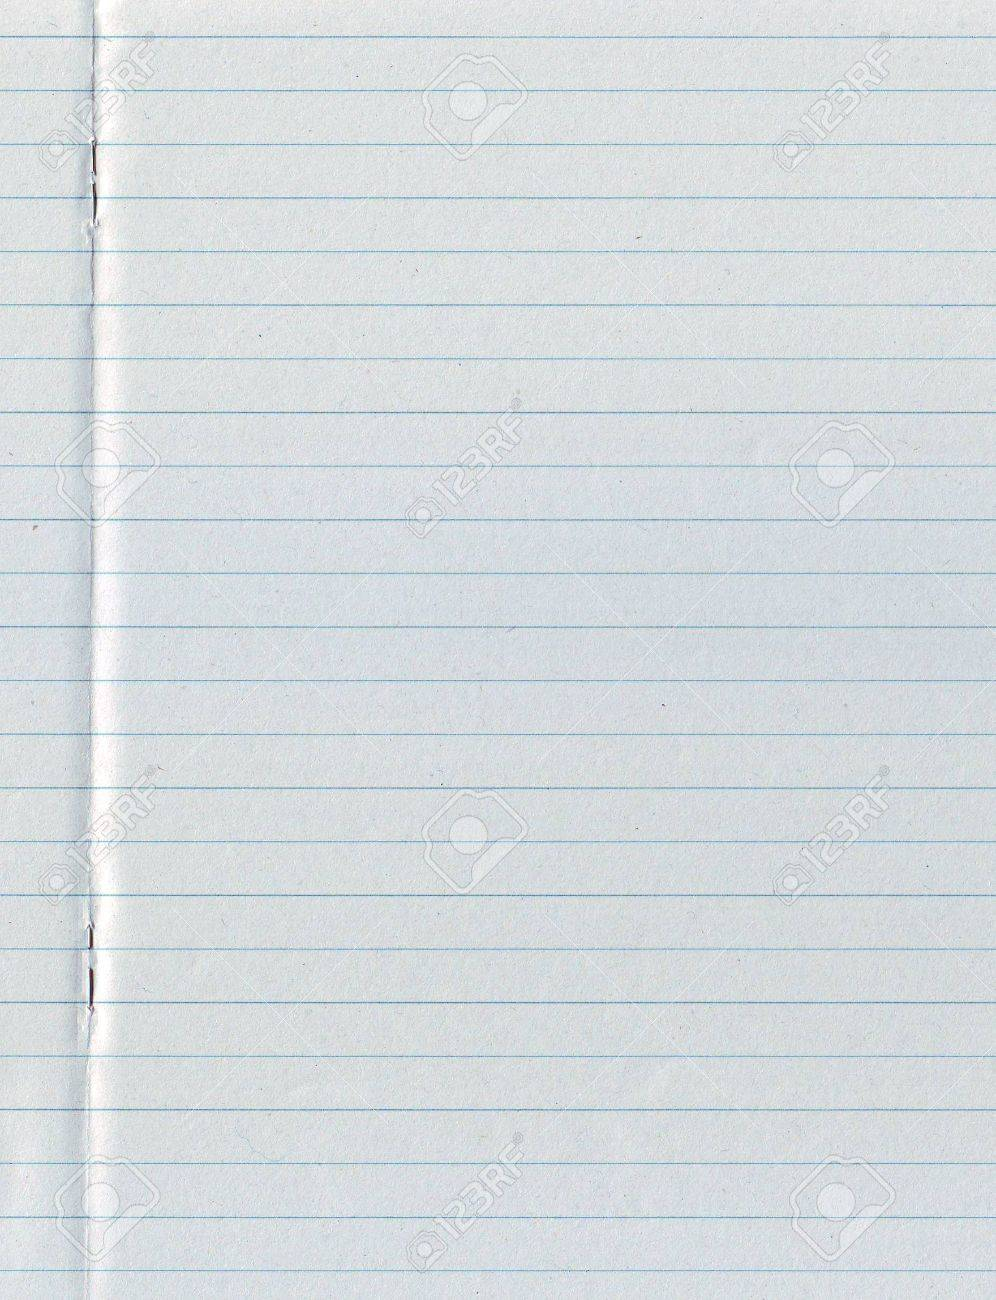 lined stationary paper – Lined Stationary Paper